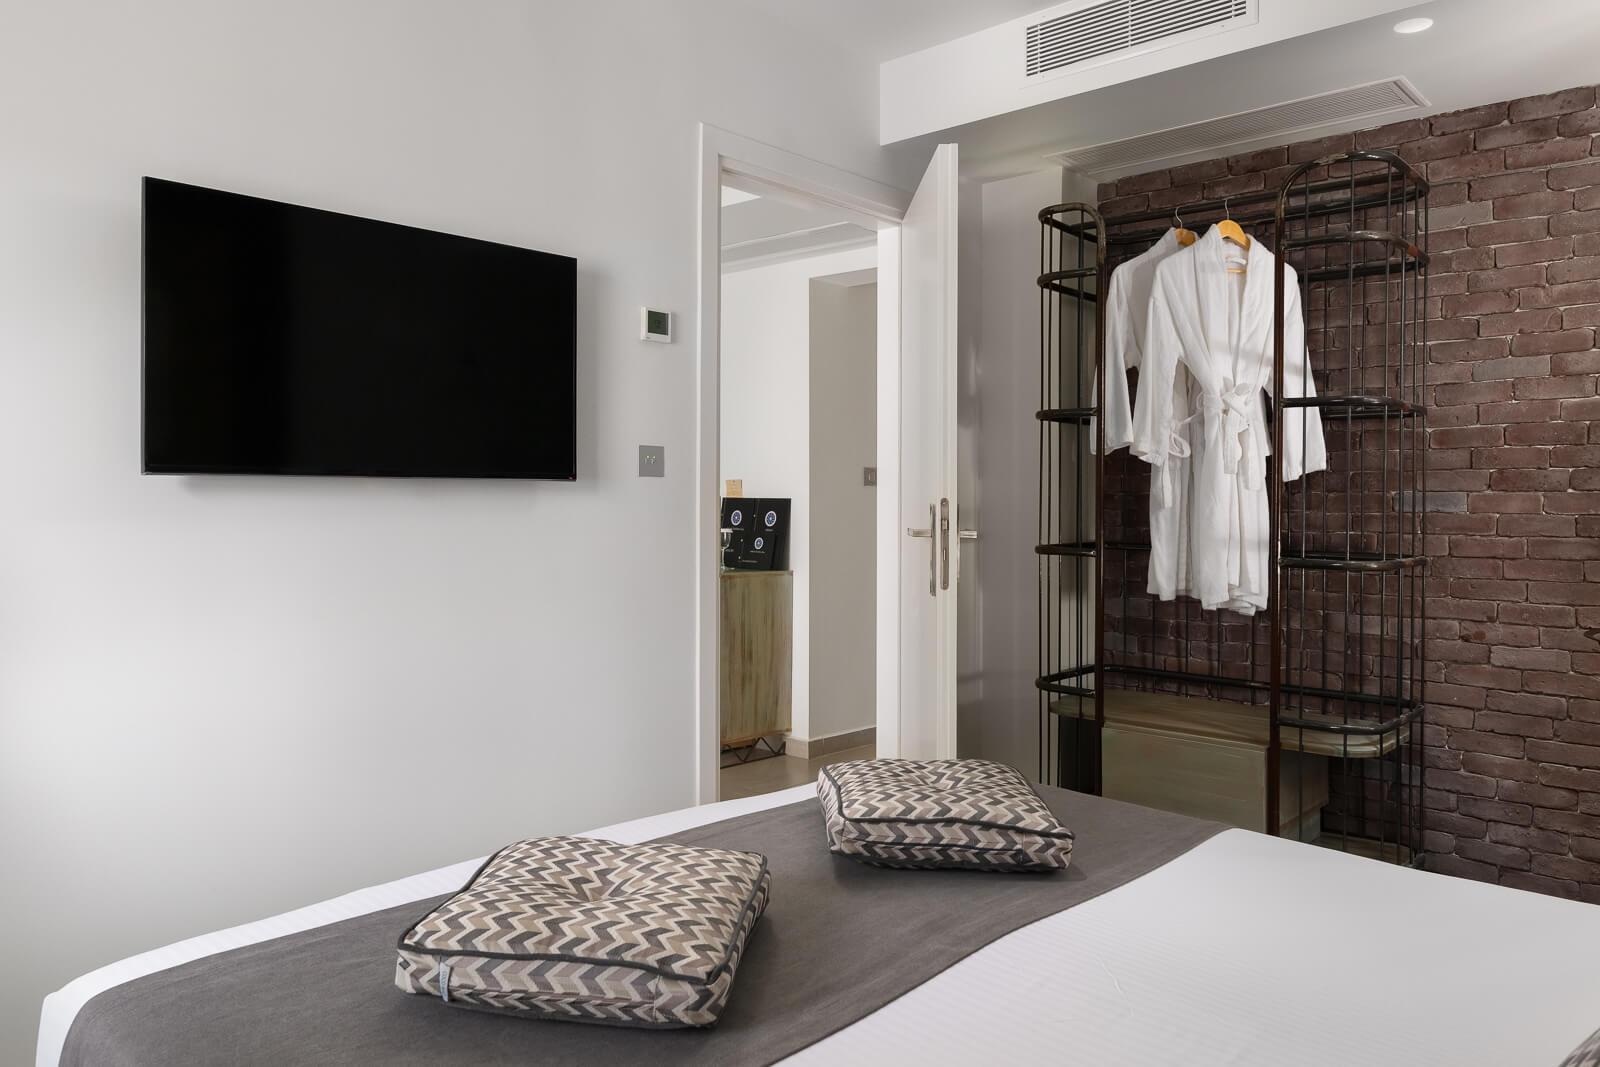 Castro Hotel Bedroom - Elakati Best Hotel in Rhodes Greece